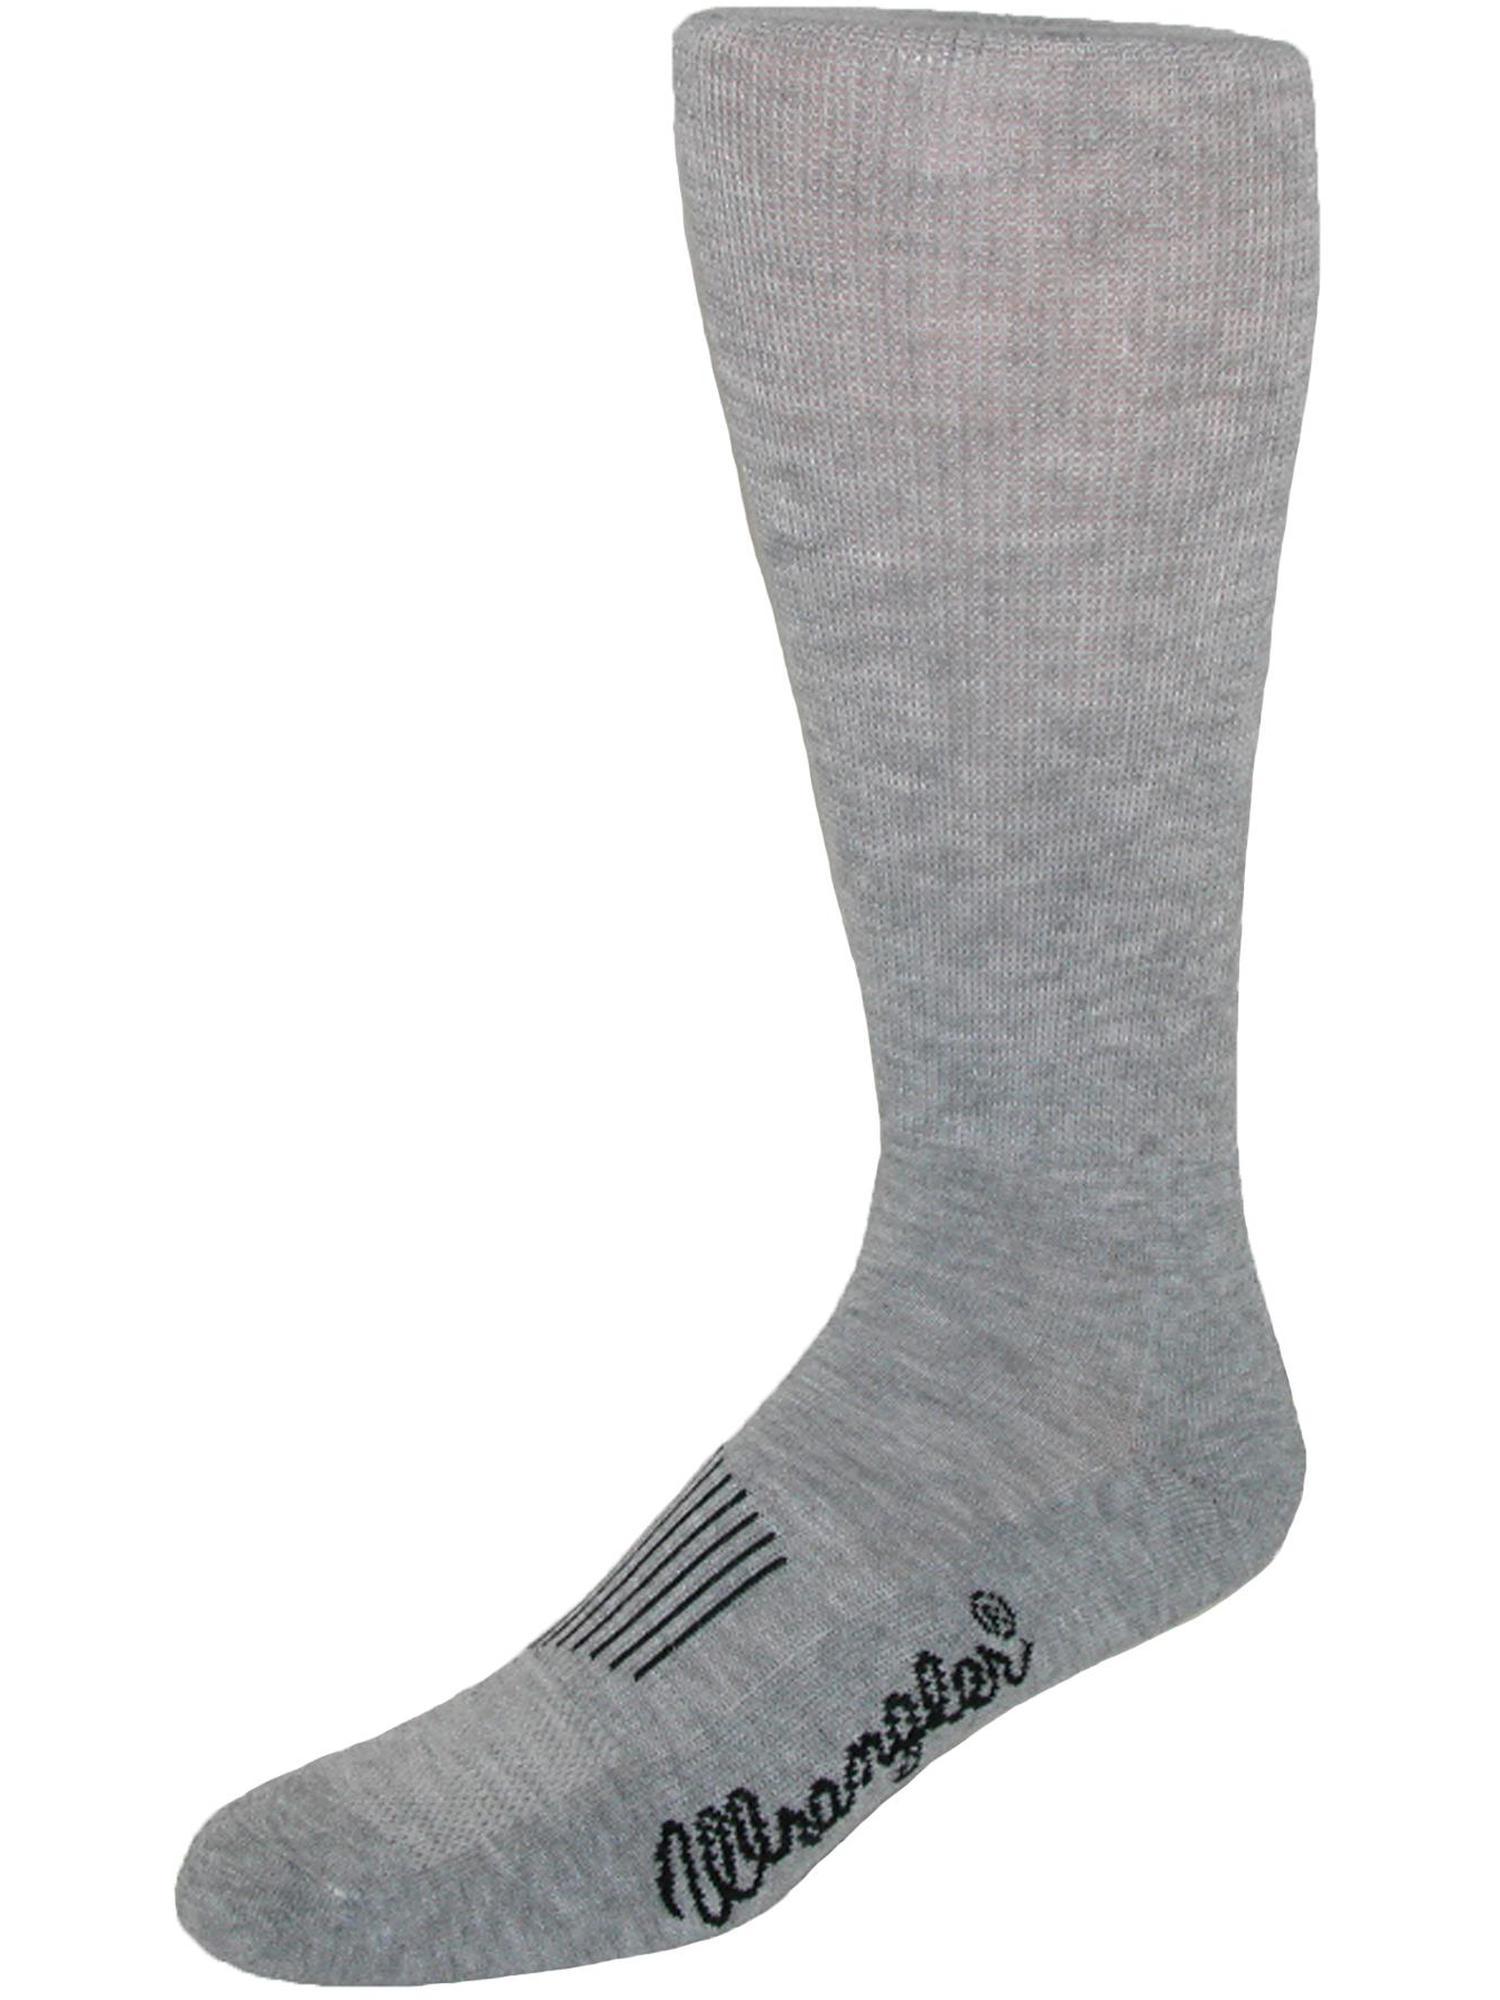 Men's Moisture Wicking Western Boot Socks